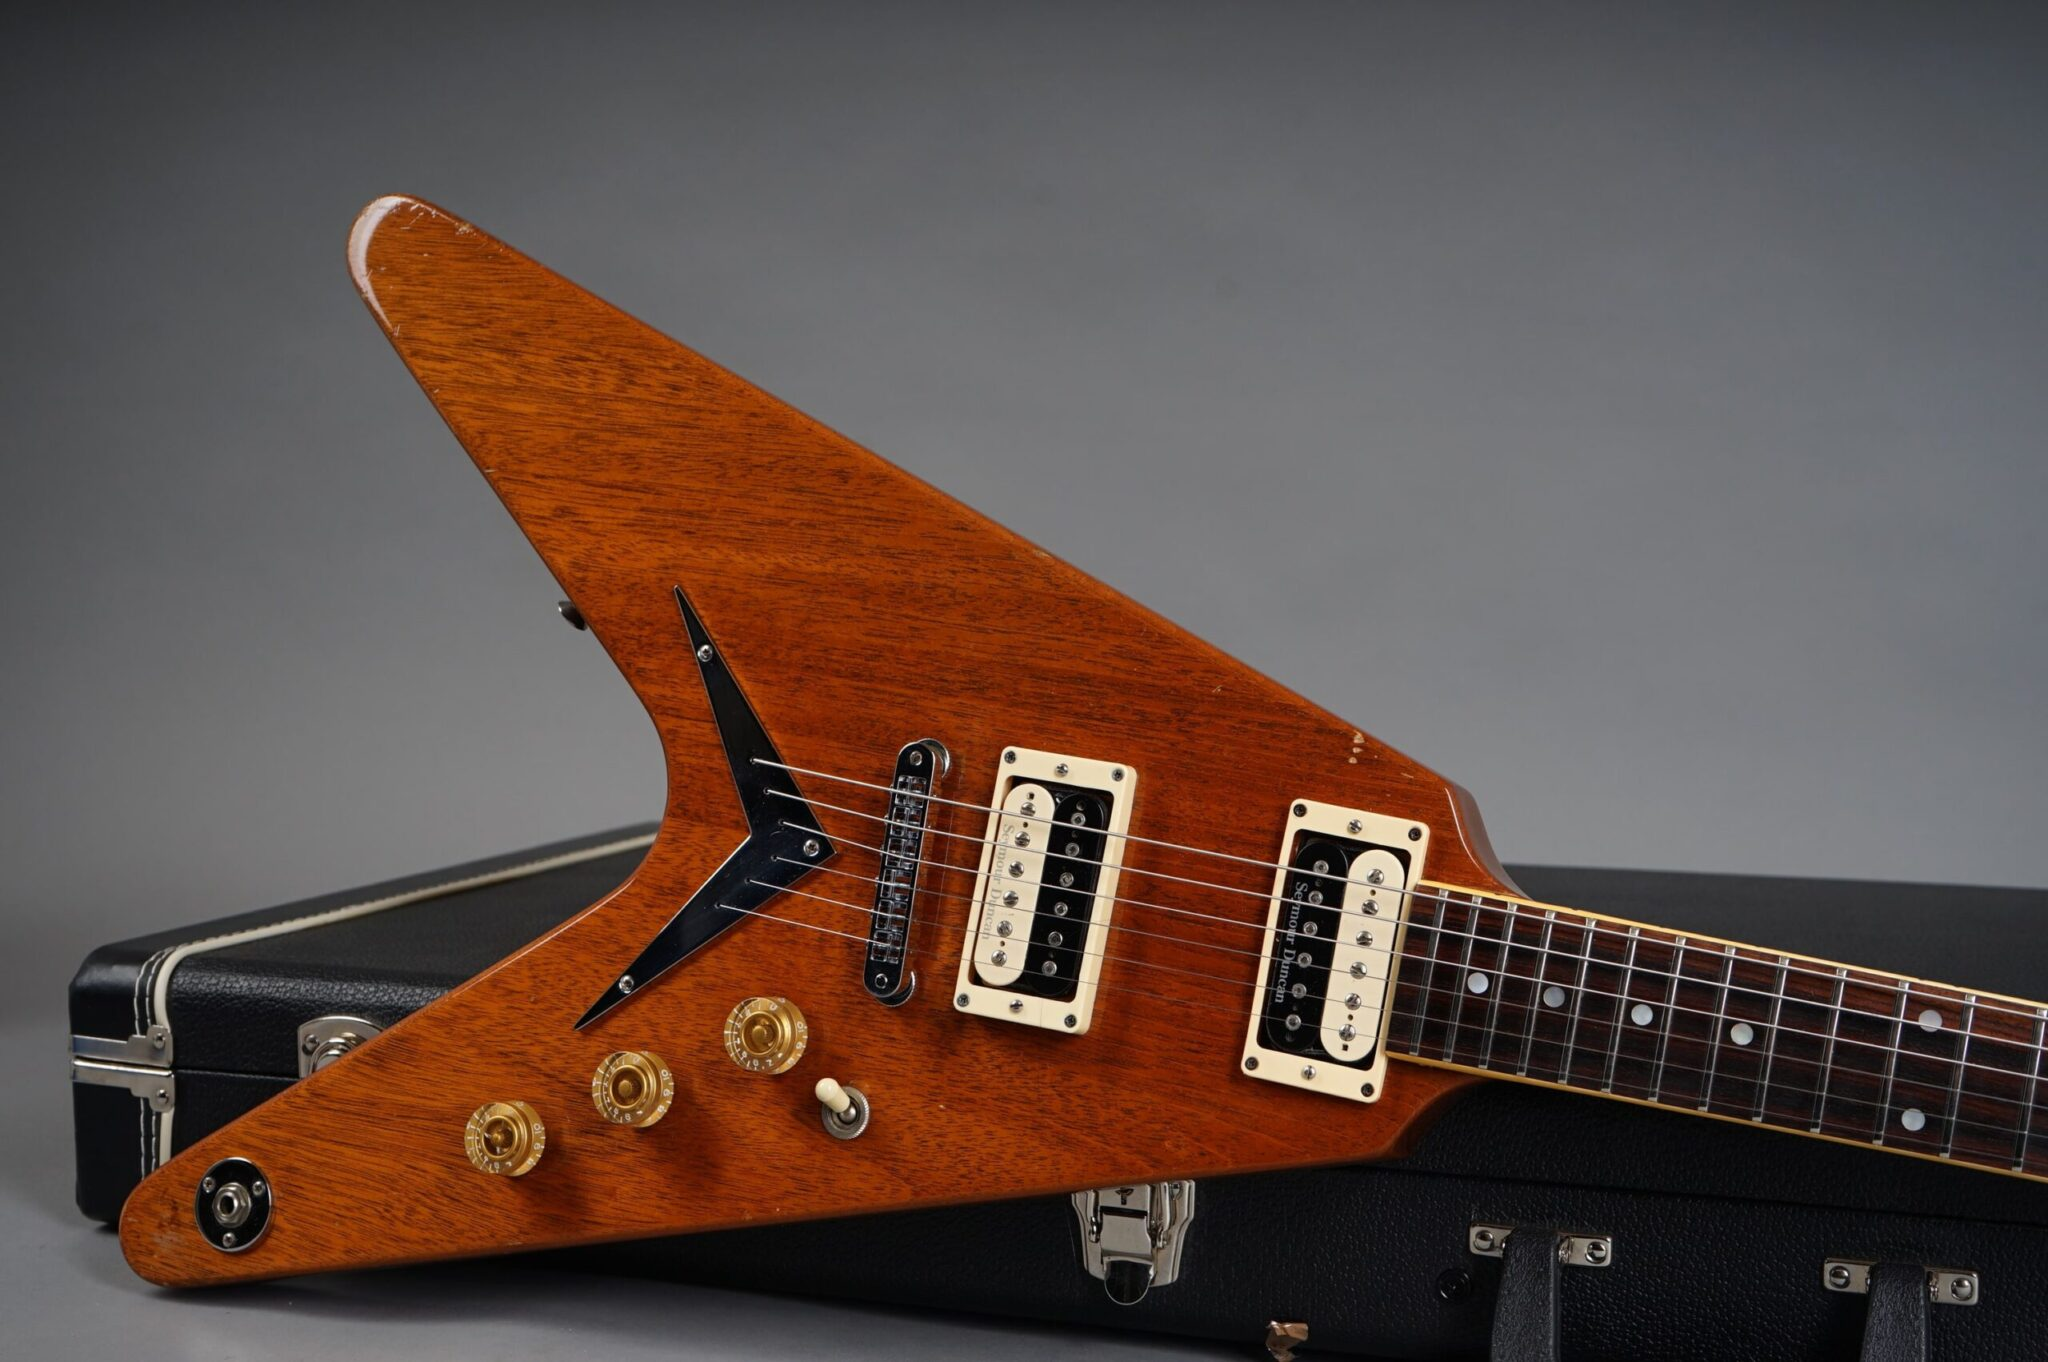 https://guitarpoint.de/app/uploads/products/1982-dean-usa-v-natural-mahogany/1982-Dean-V-Natural-8205073-19-scaled-2048x1362.jpg